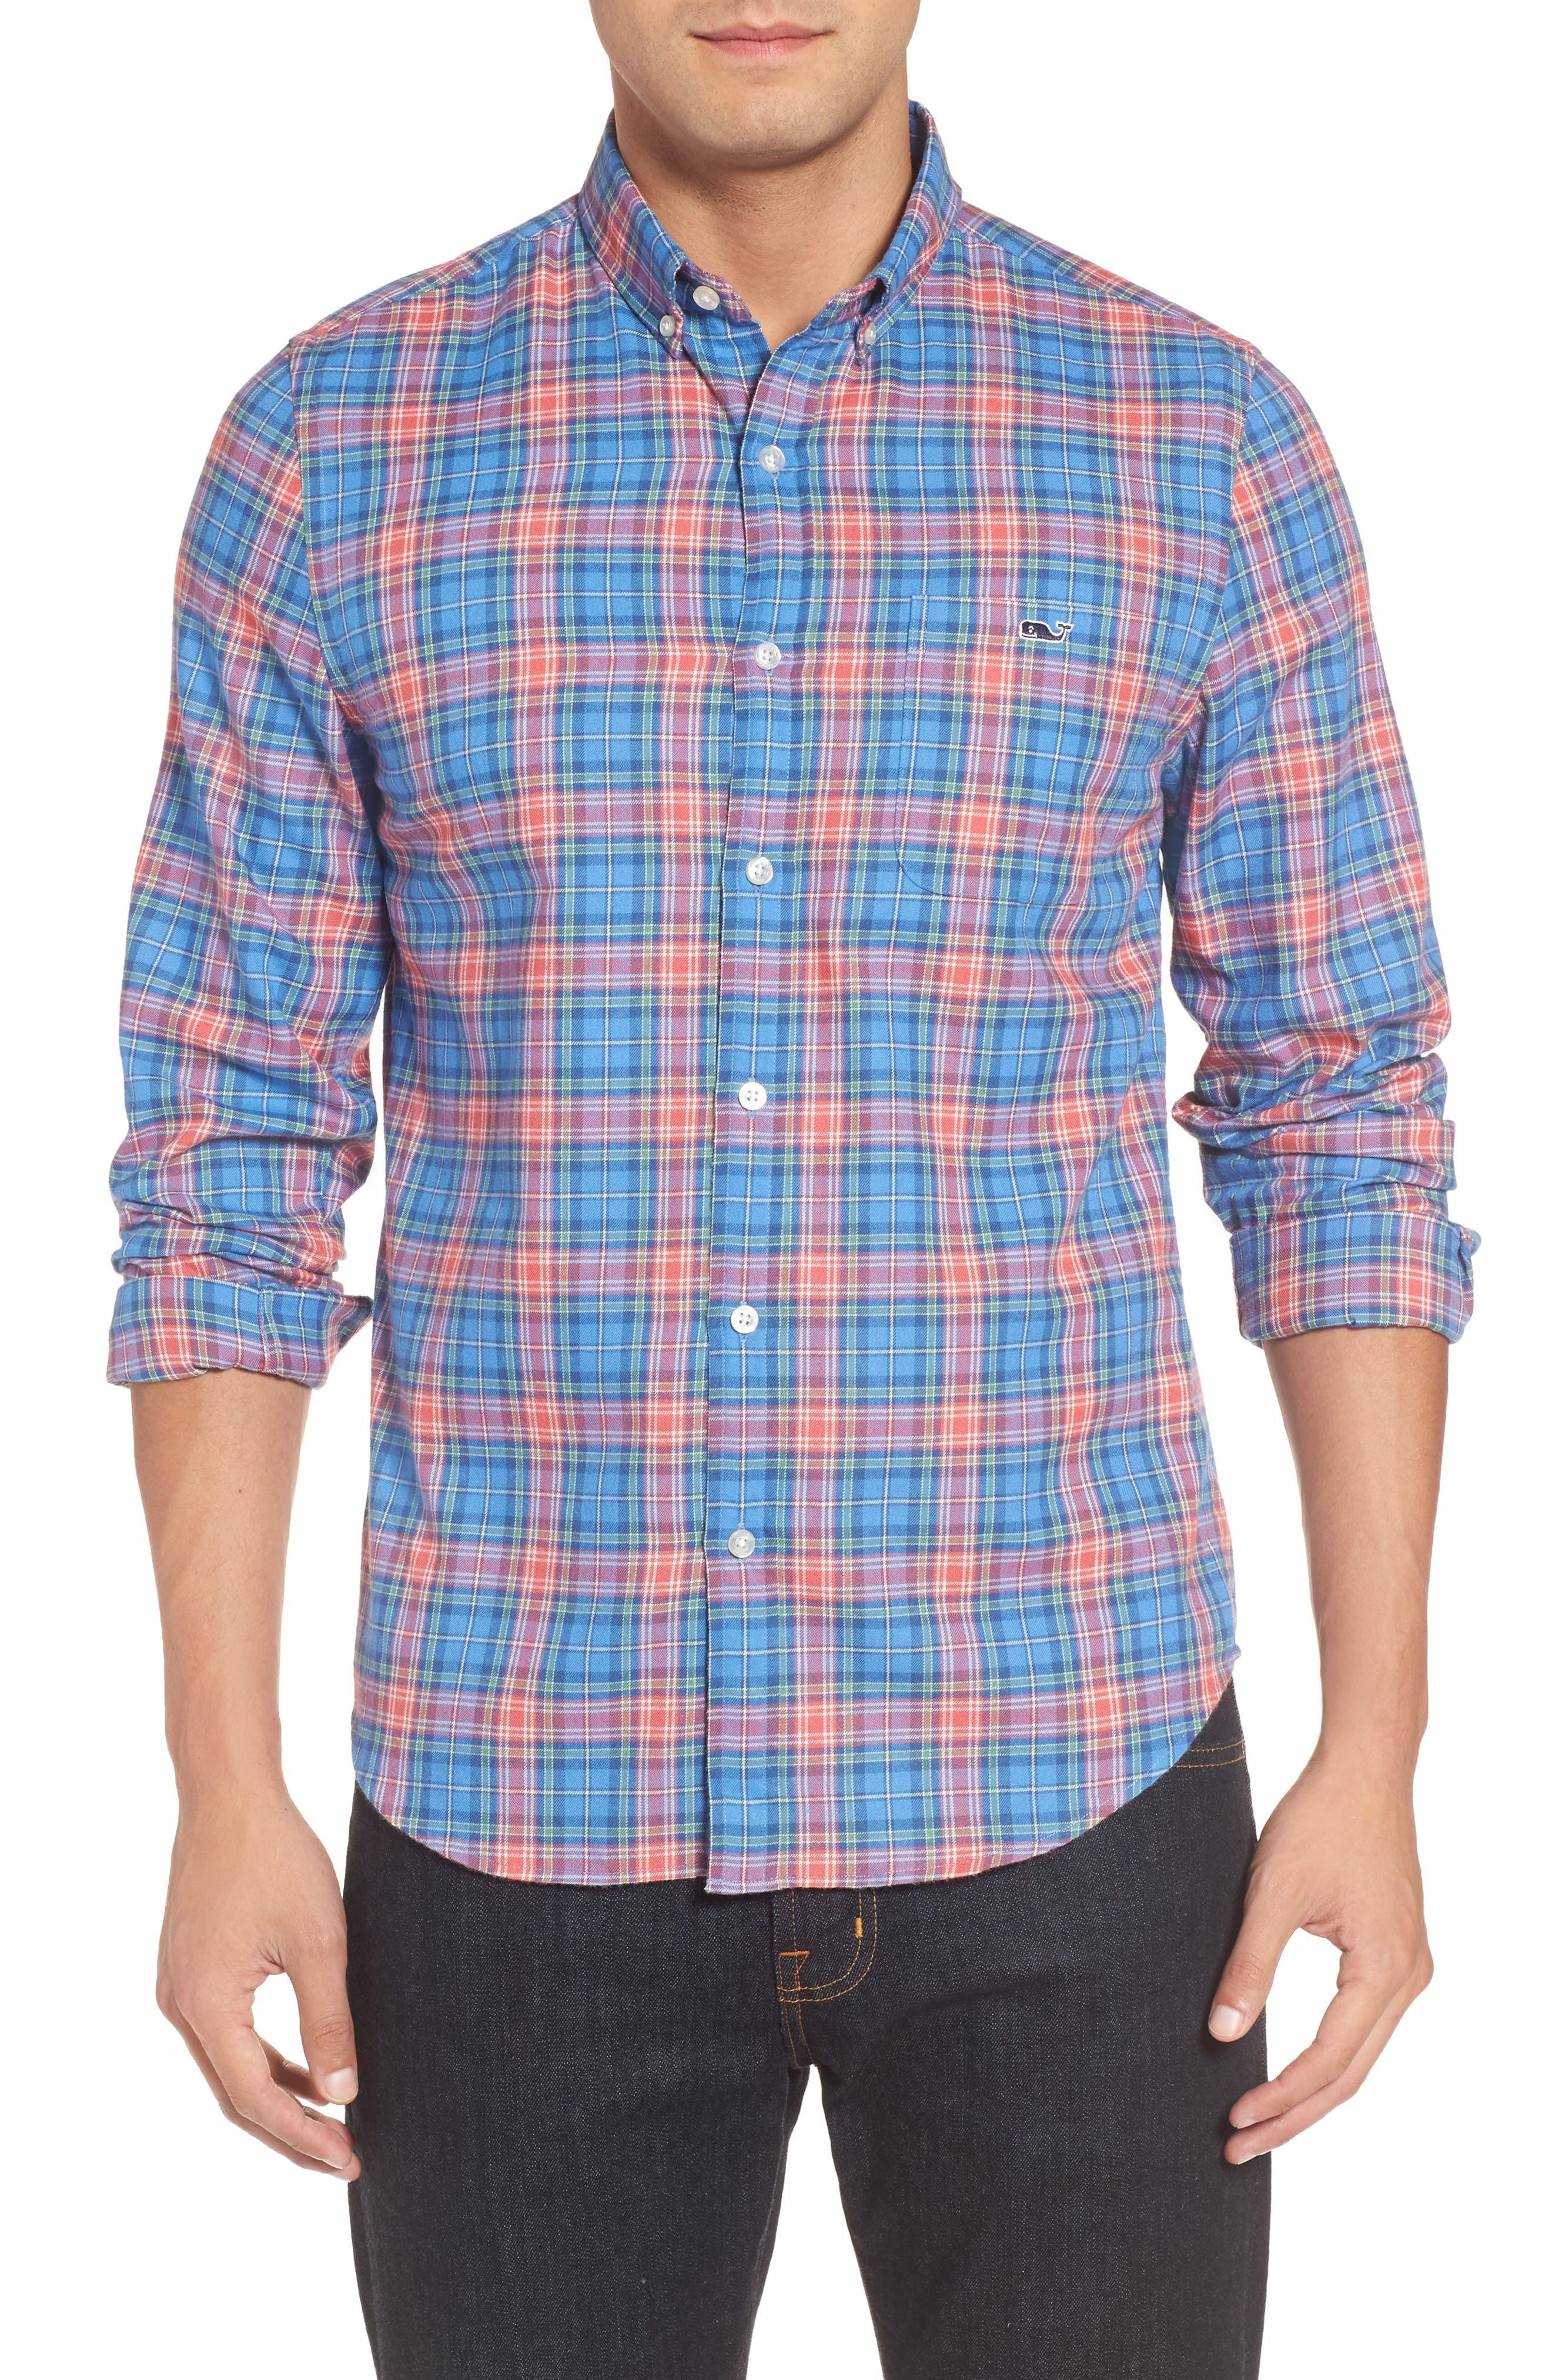 Kingsley Park Slim Fit Plaid Sport Shirt,                         Main,                         color, Bimini Blue